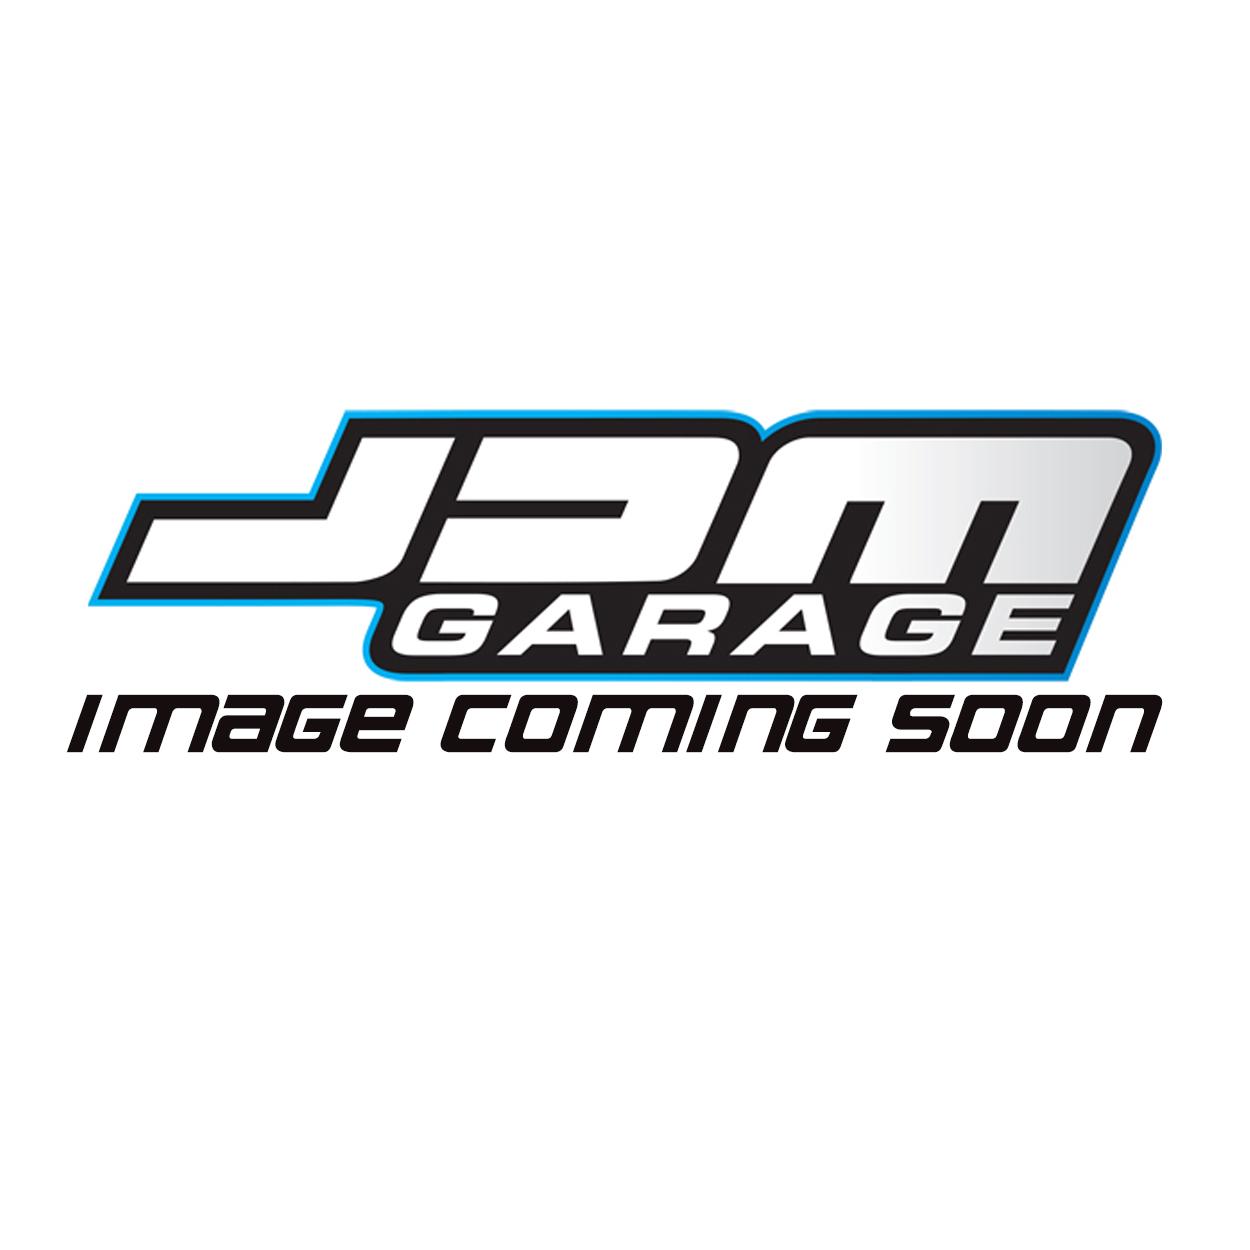 Genuine Rocker Cover Bolt Seal Washer Fits Toyota Supra JZA80 / Aristo / Lexus IS300 GS300 / 2JZ-GE GTE 90210-07001